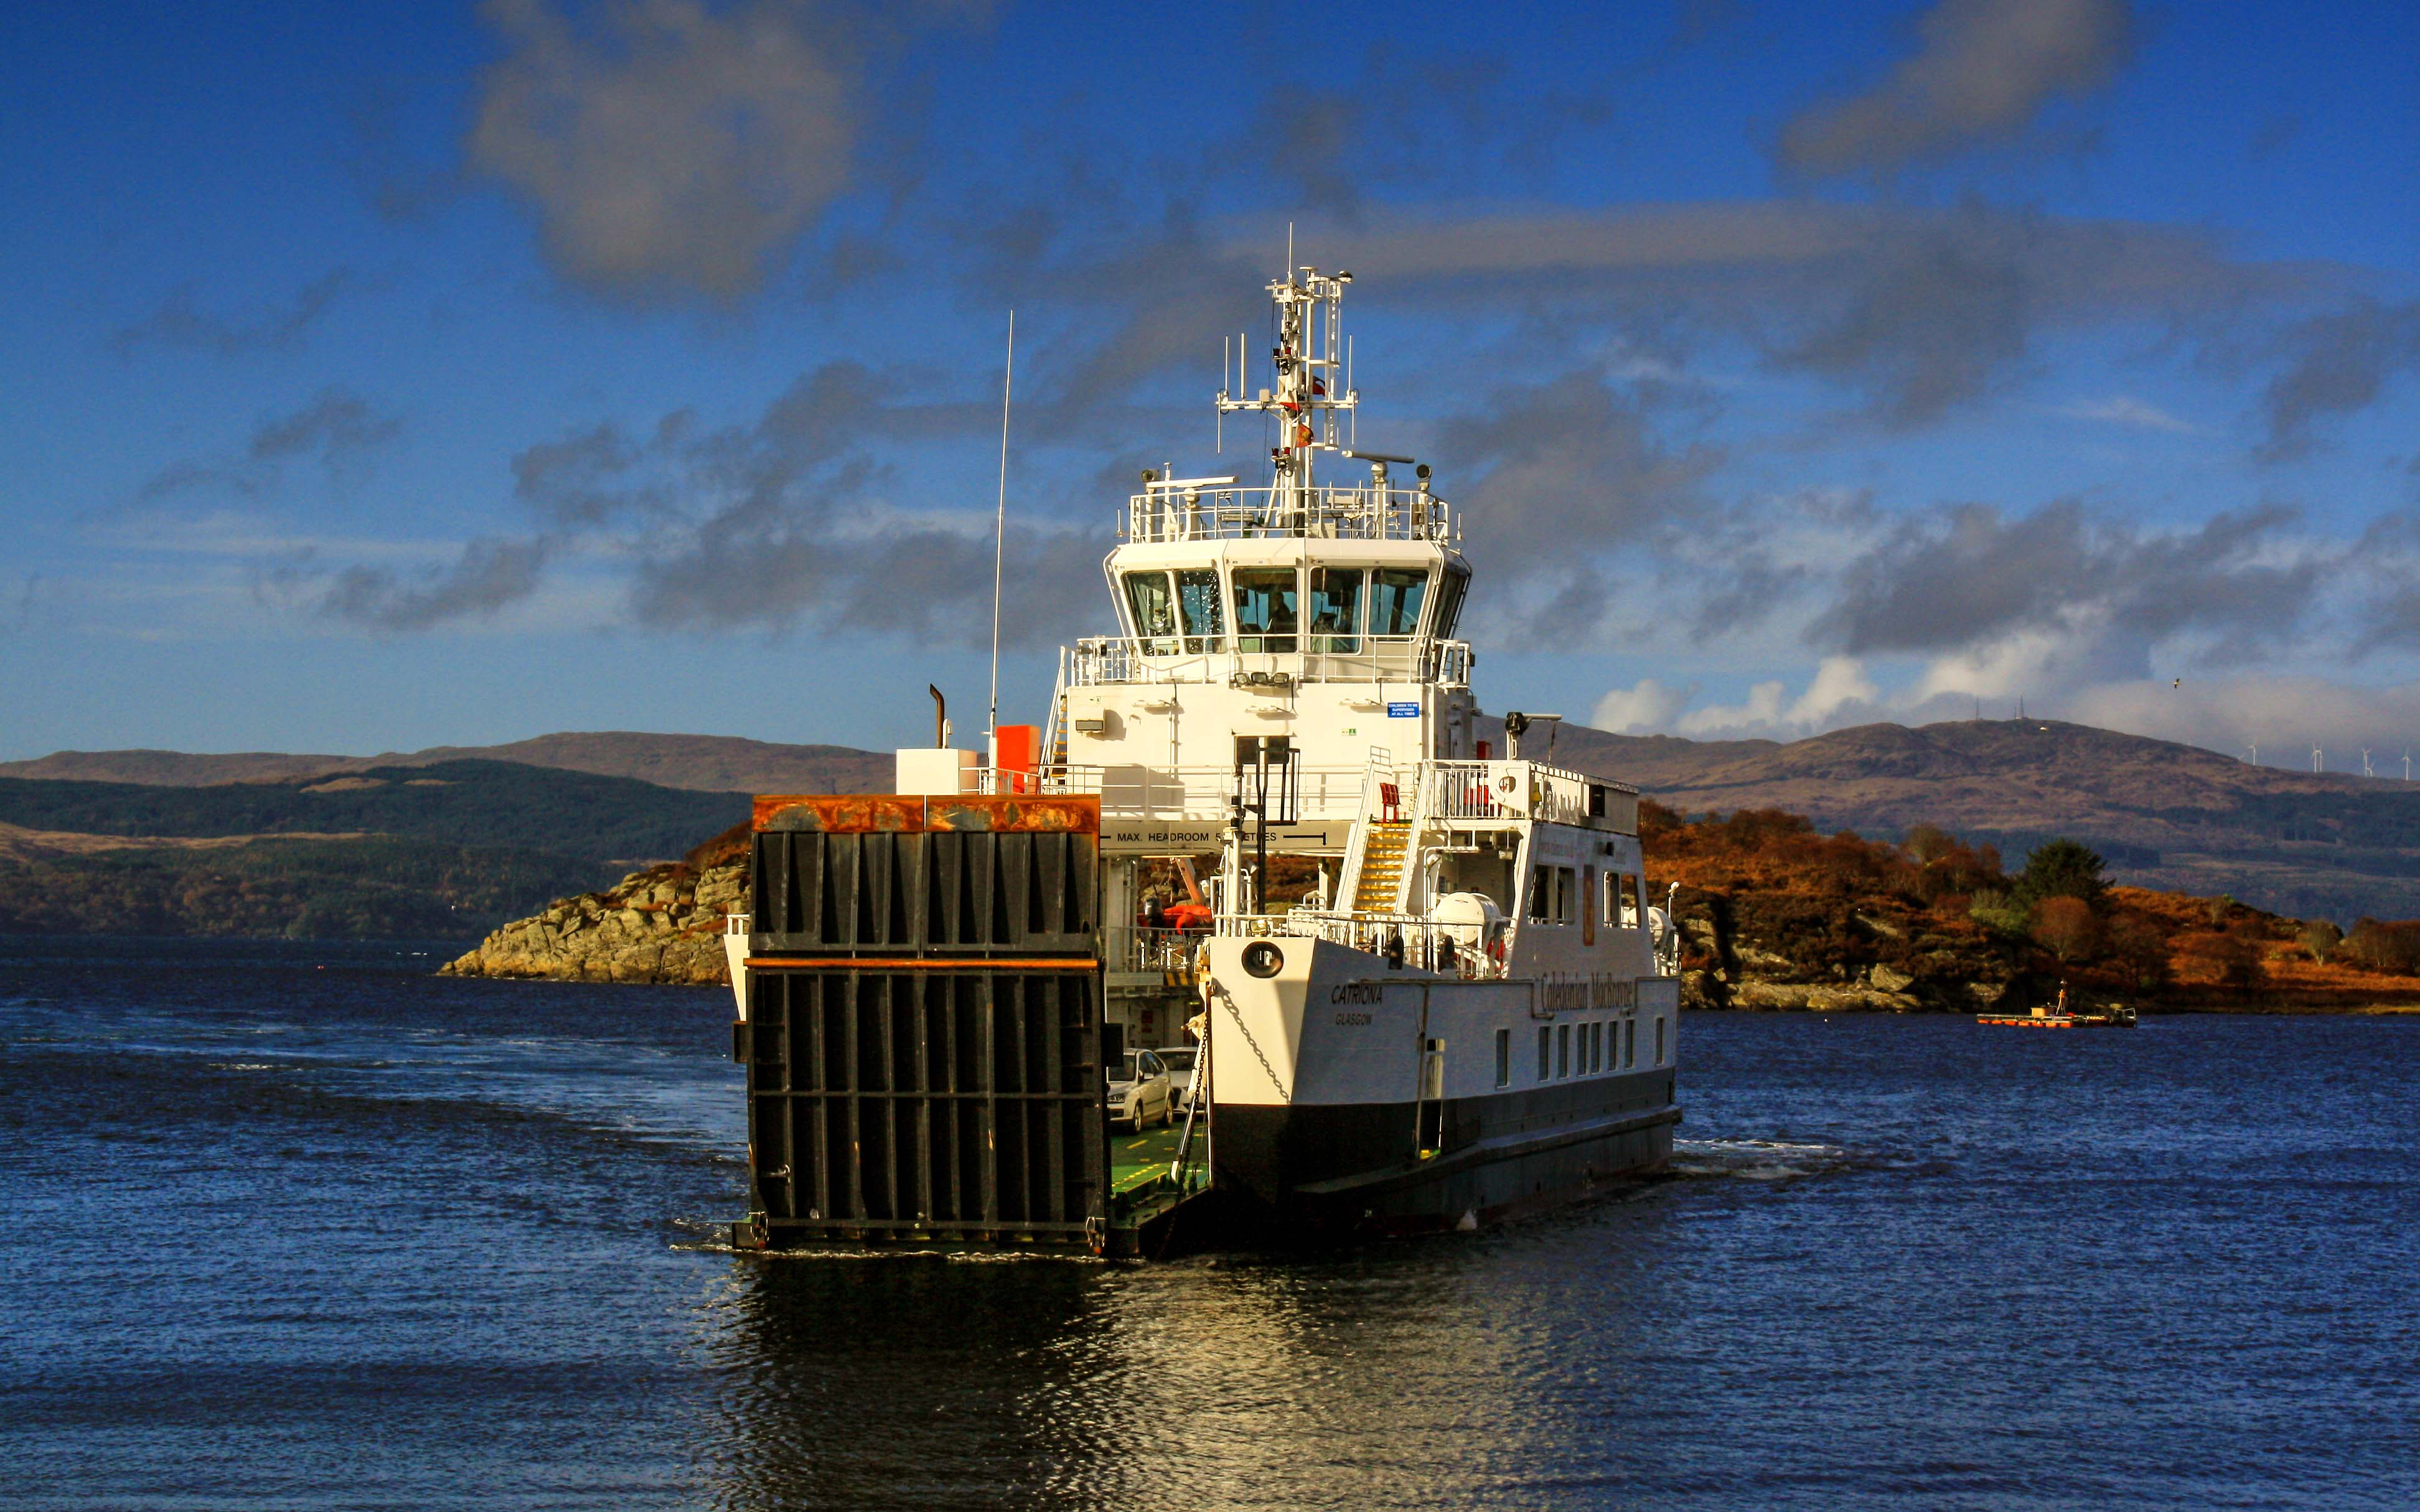 Catriona arriving at Portavadie (Ships of CalMac)